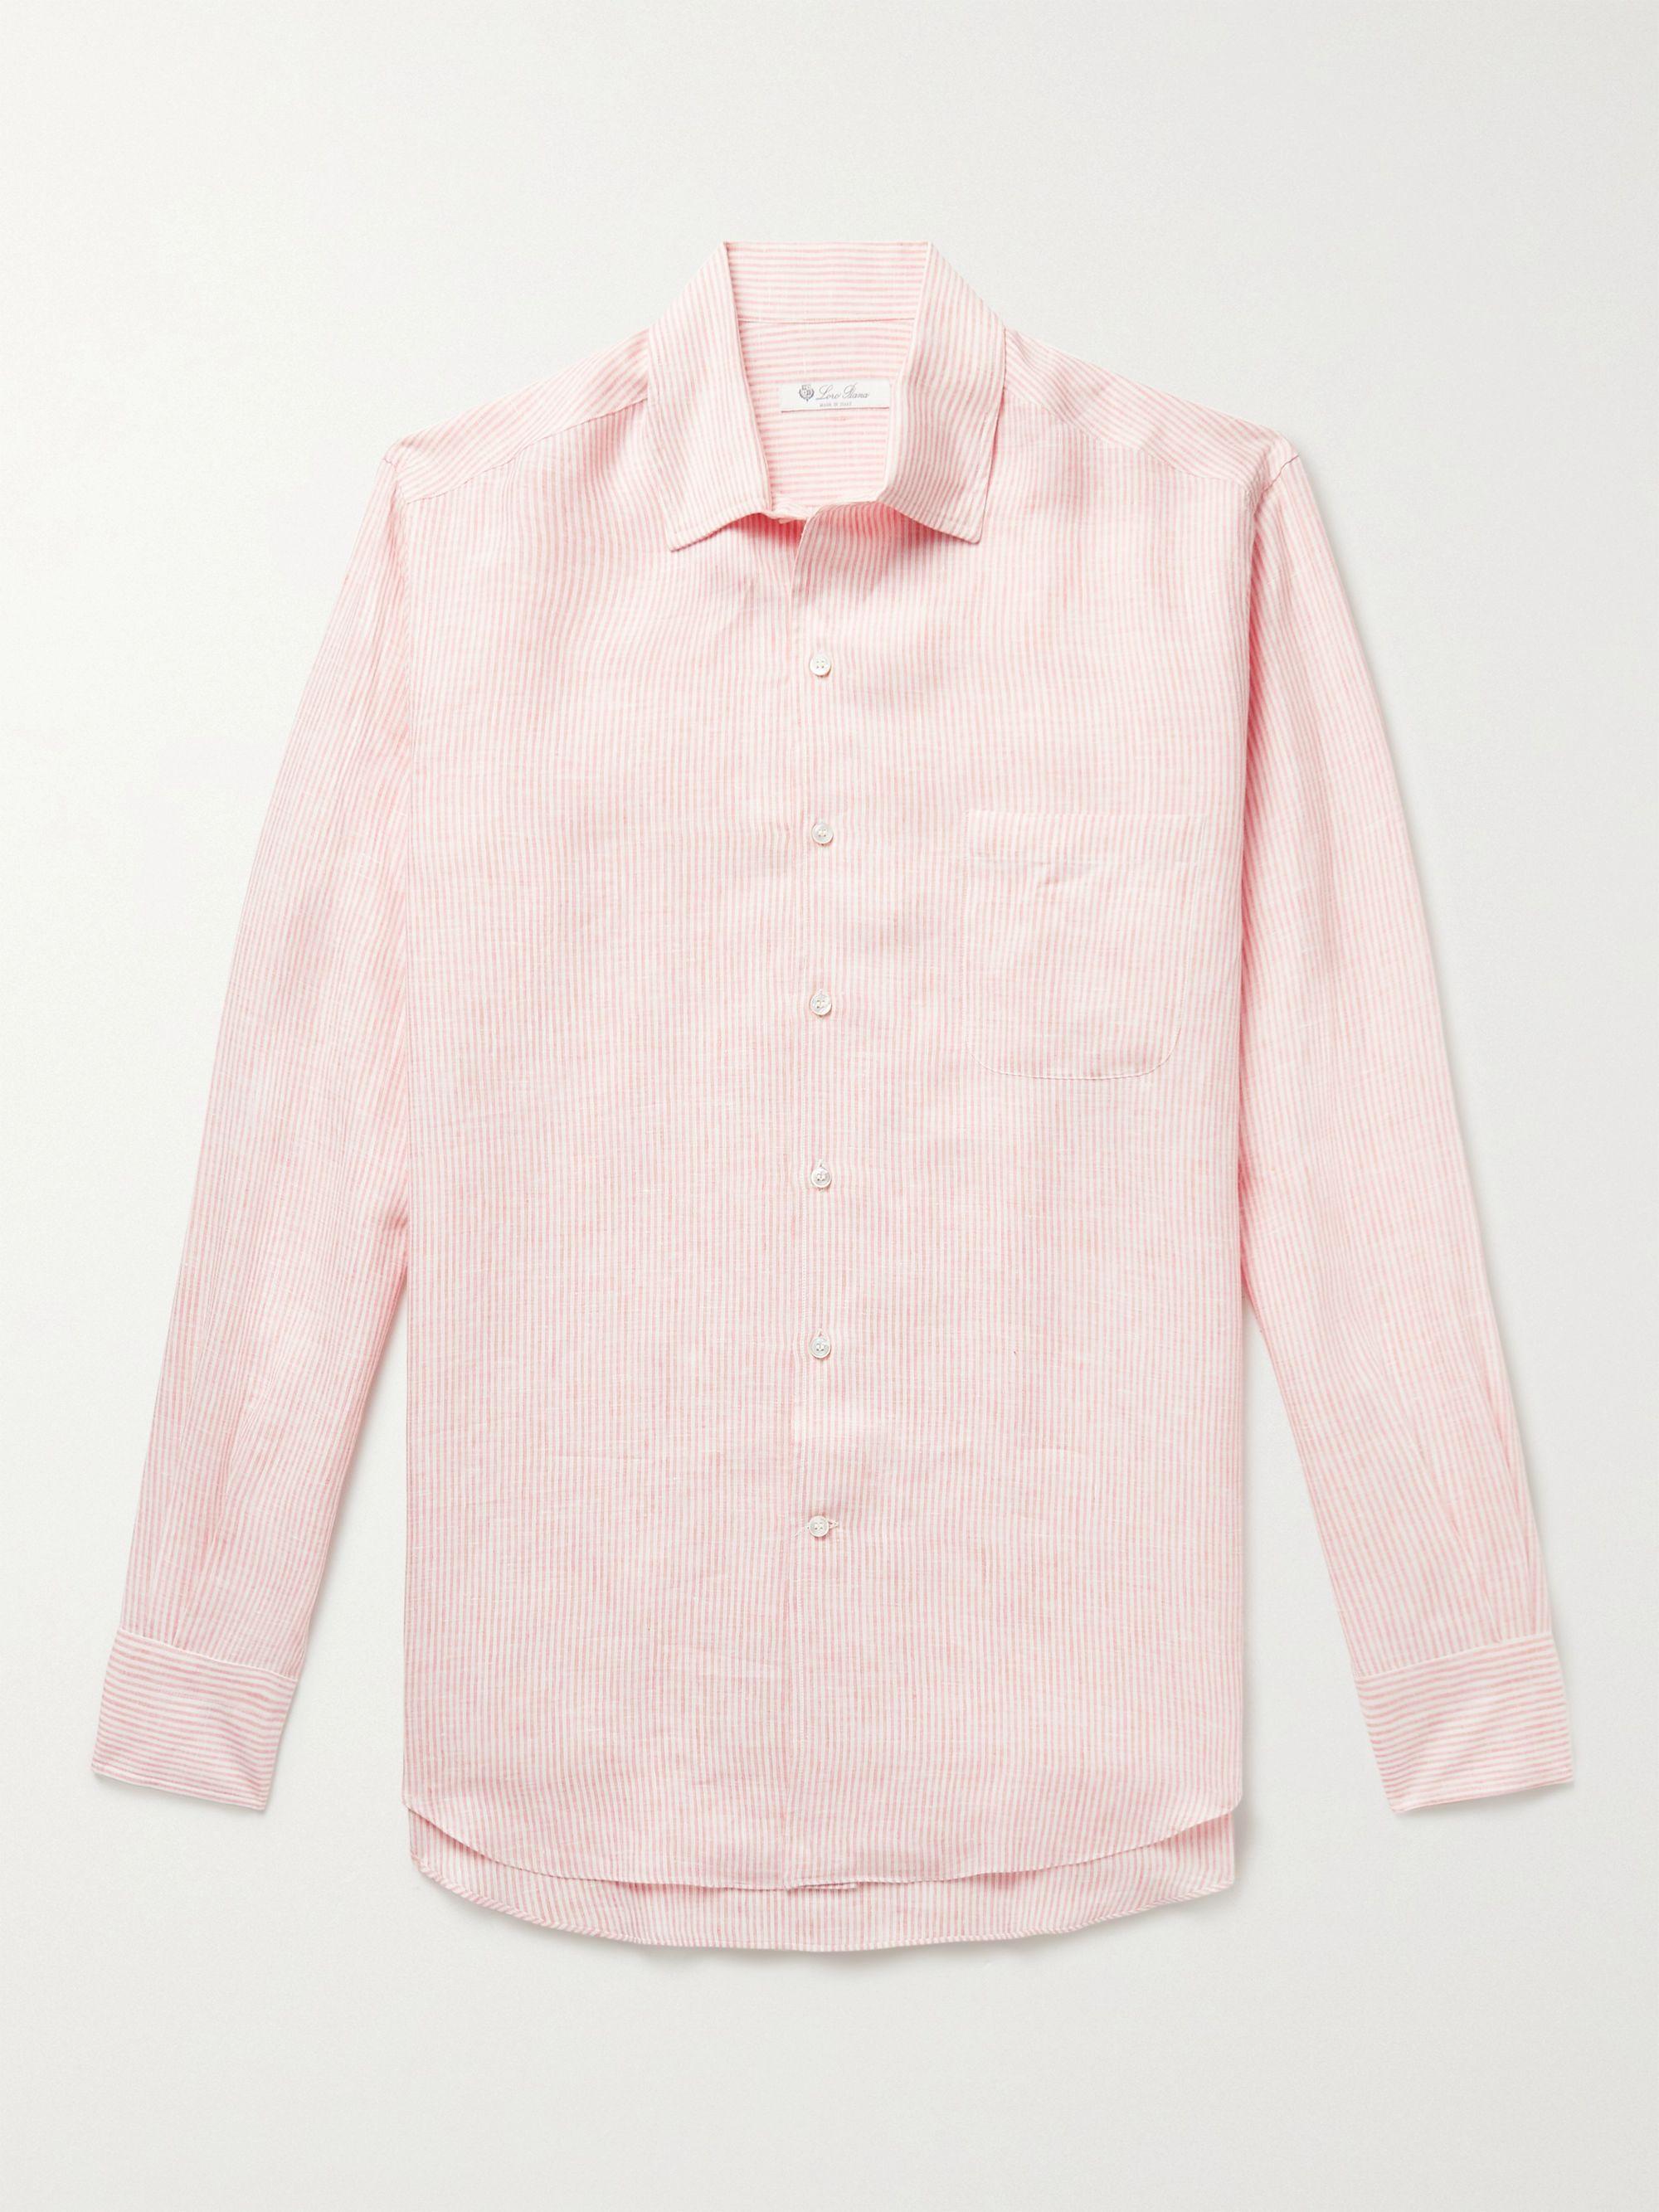 LORO PIANA Striped Linen Shirt,Pink